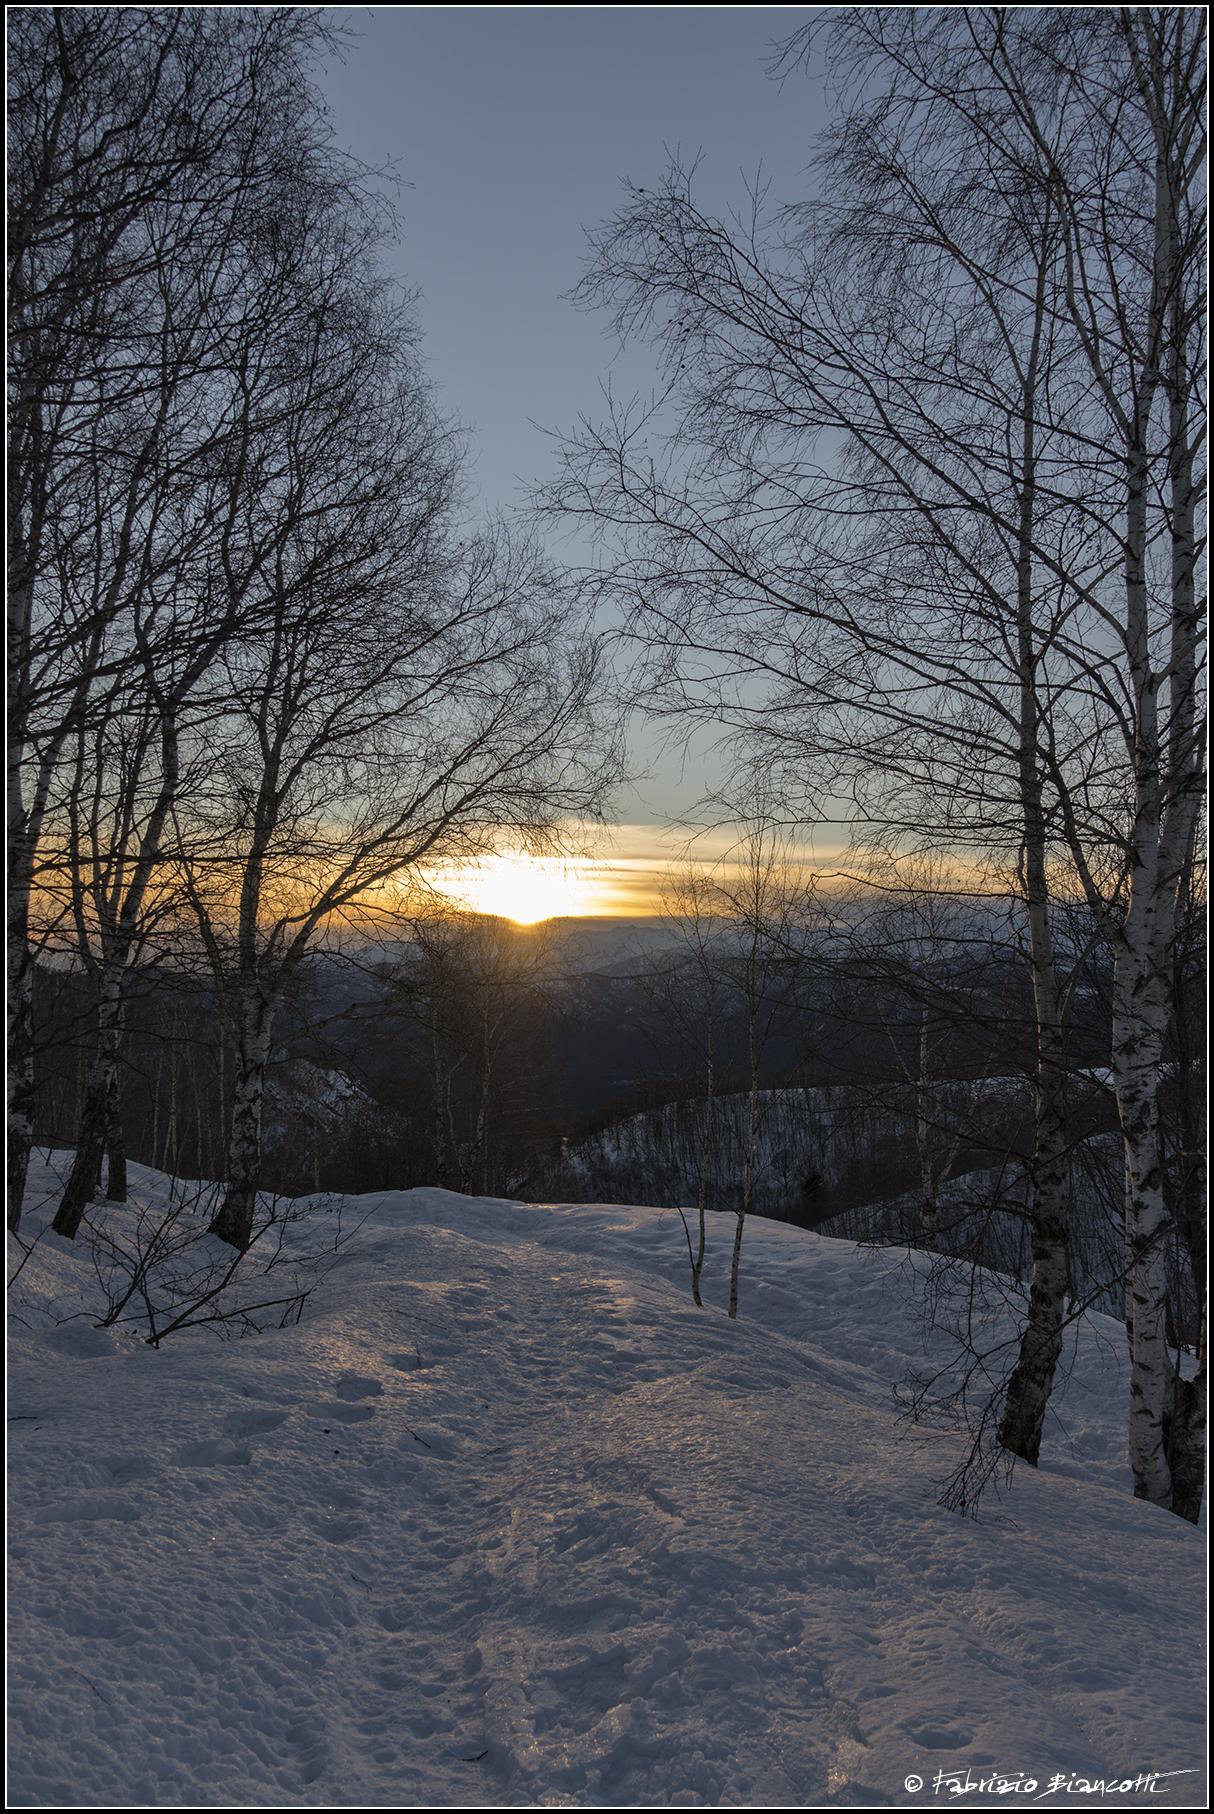 Mi mancavano i tramonti sulle ciaspole...